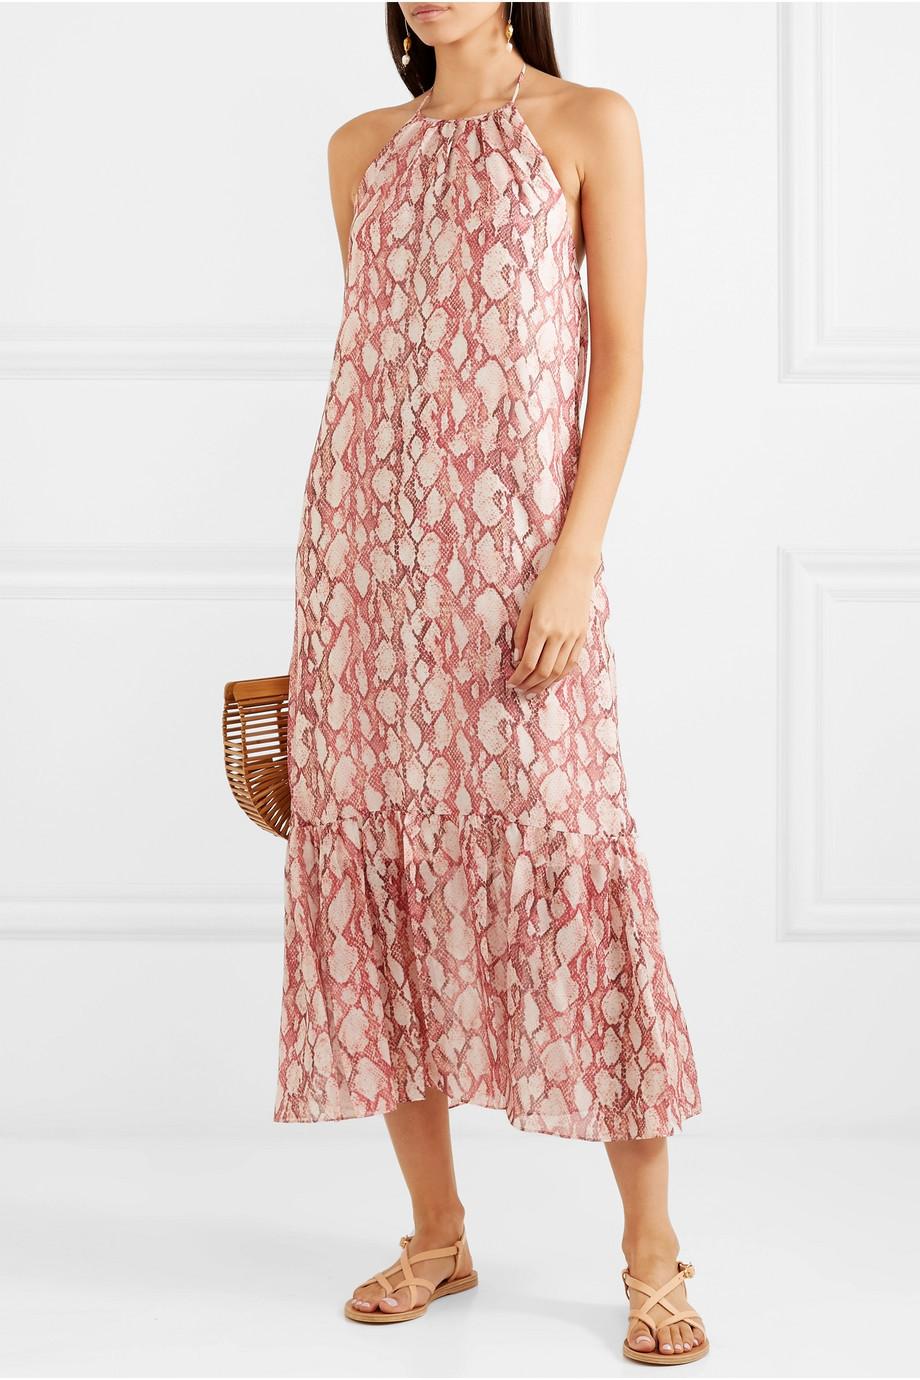 Rachel Zoe Harriet snake-print silk-chiffon dress $425